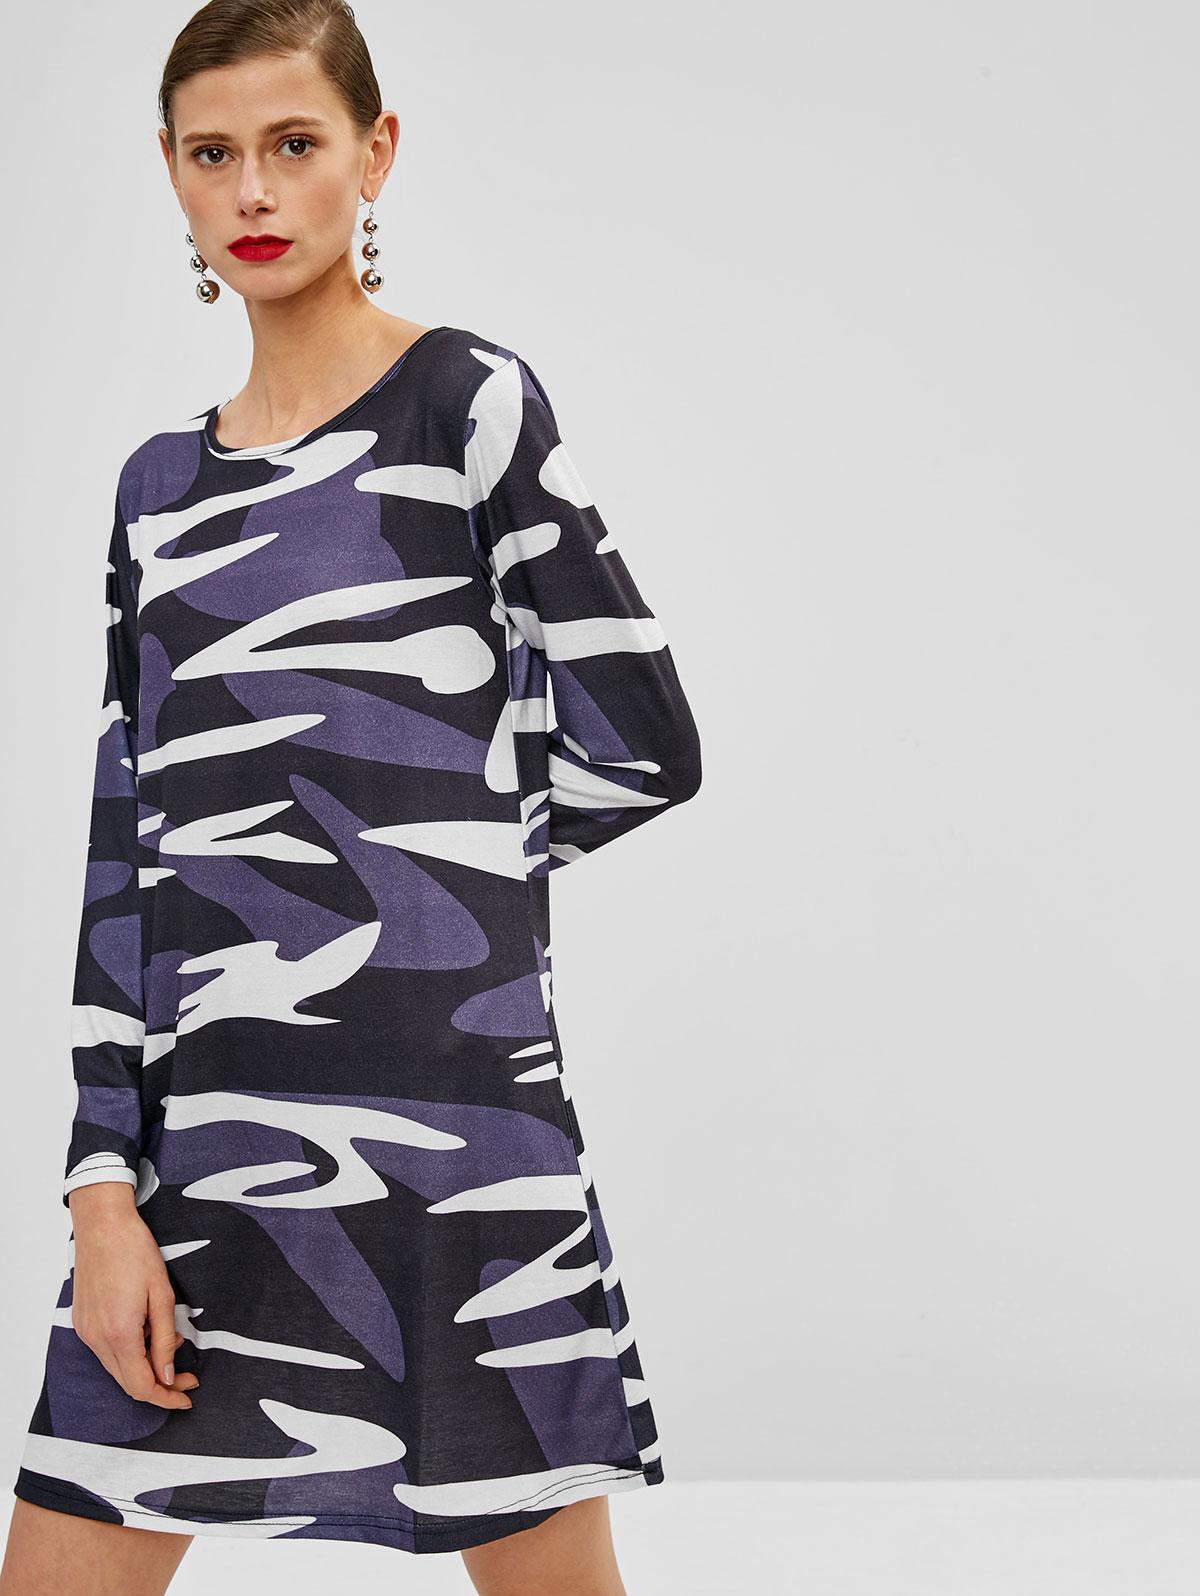 Long Sleeves Camouflage Mini Dress